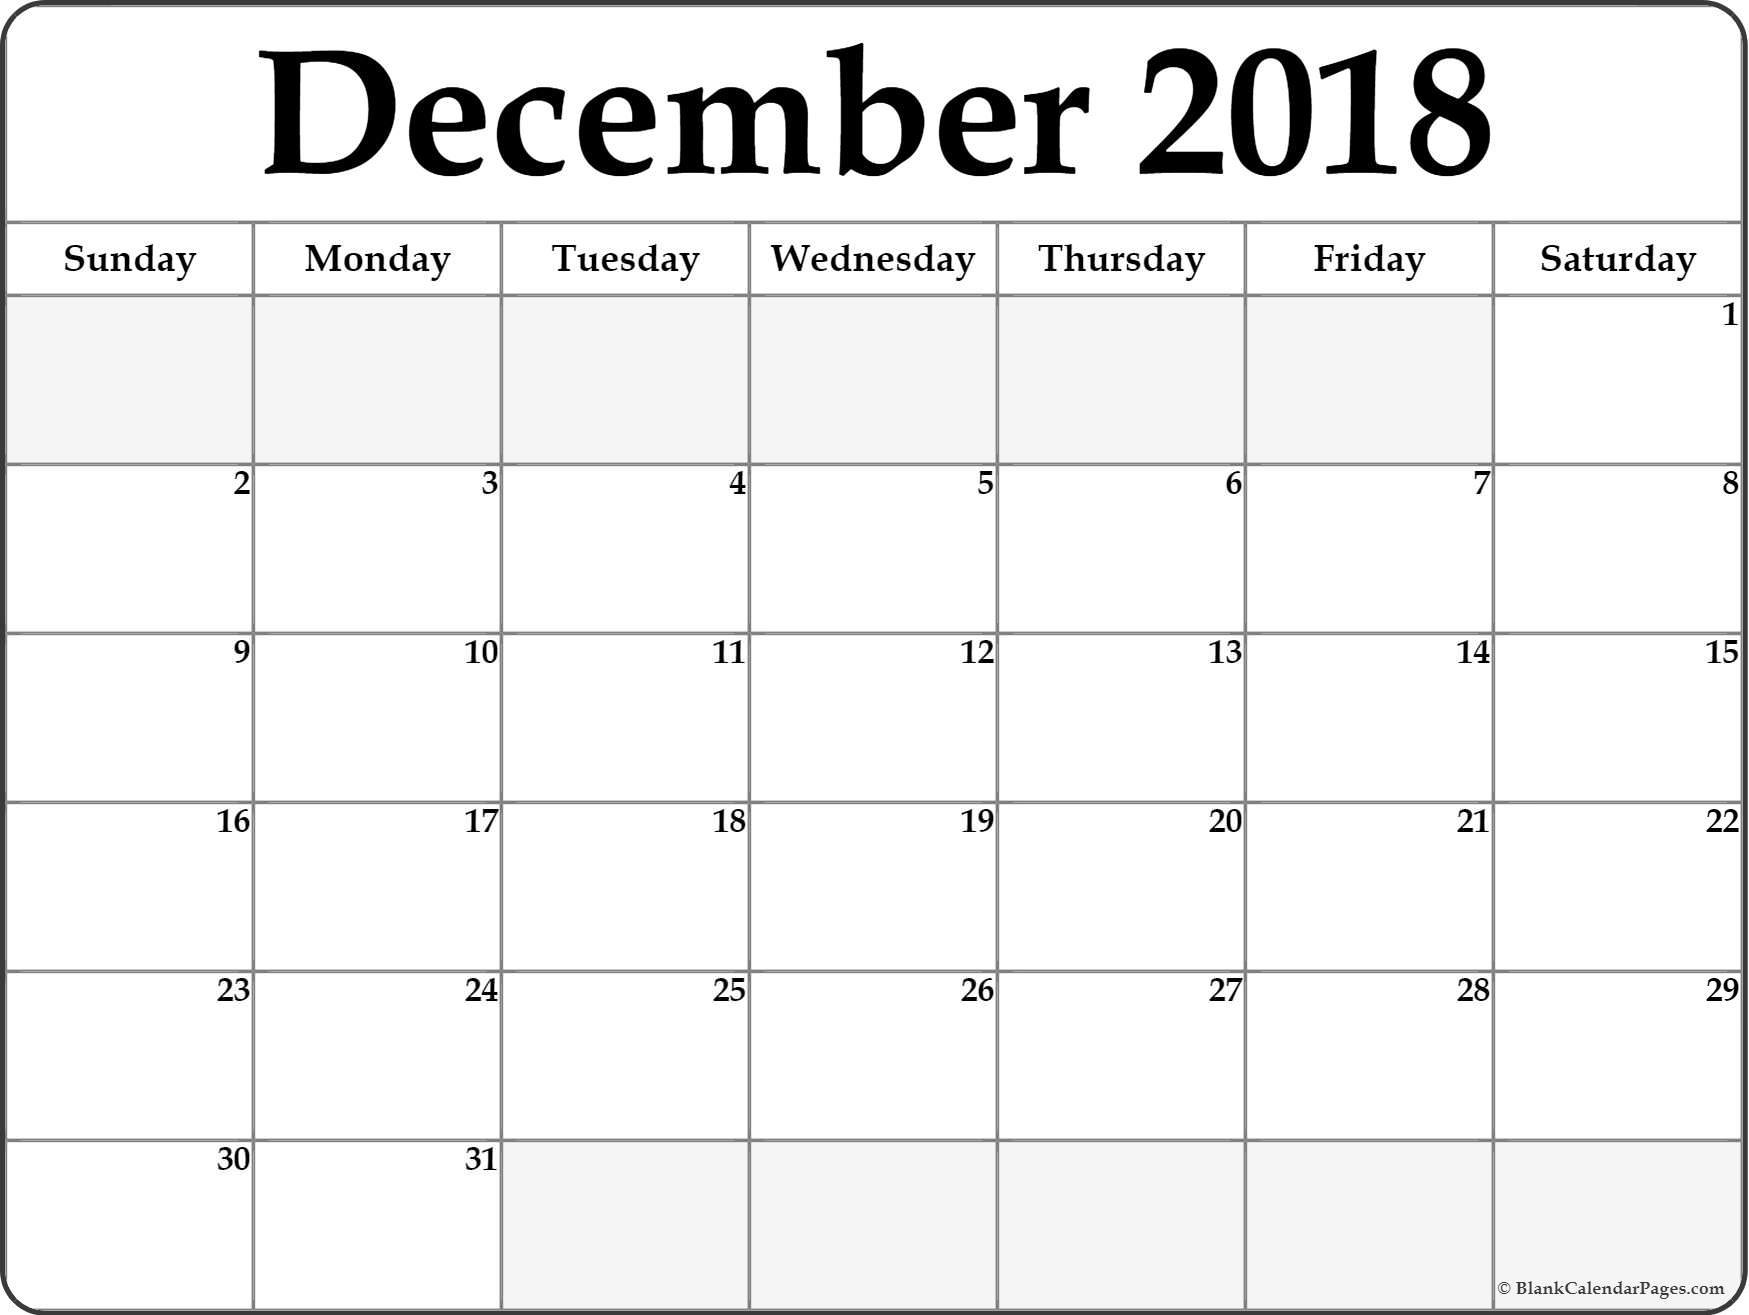 December 2018 Calendar Printable- Free Templates - Printable_Calendar Blank Templates Free